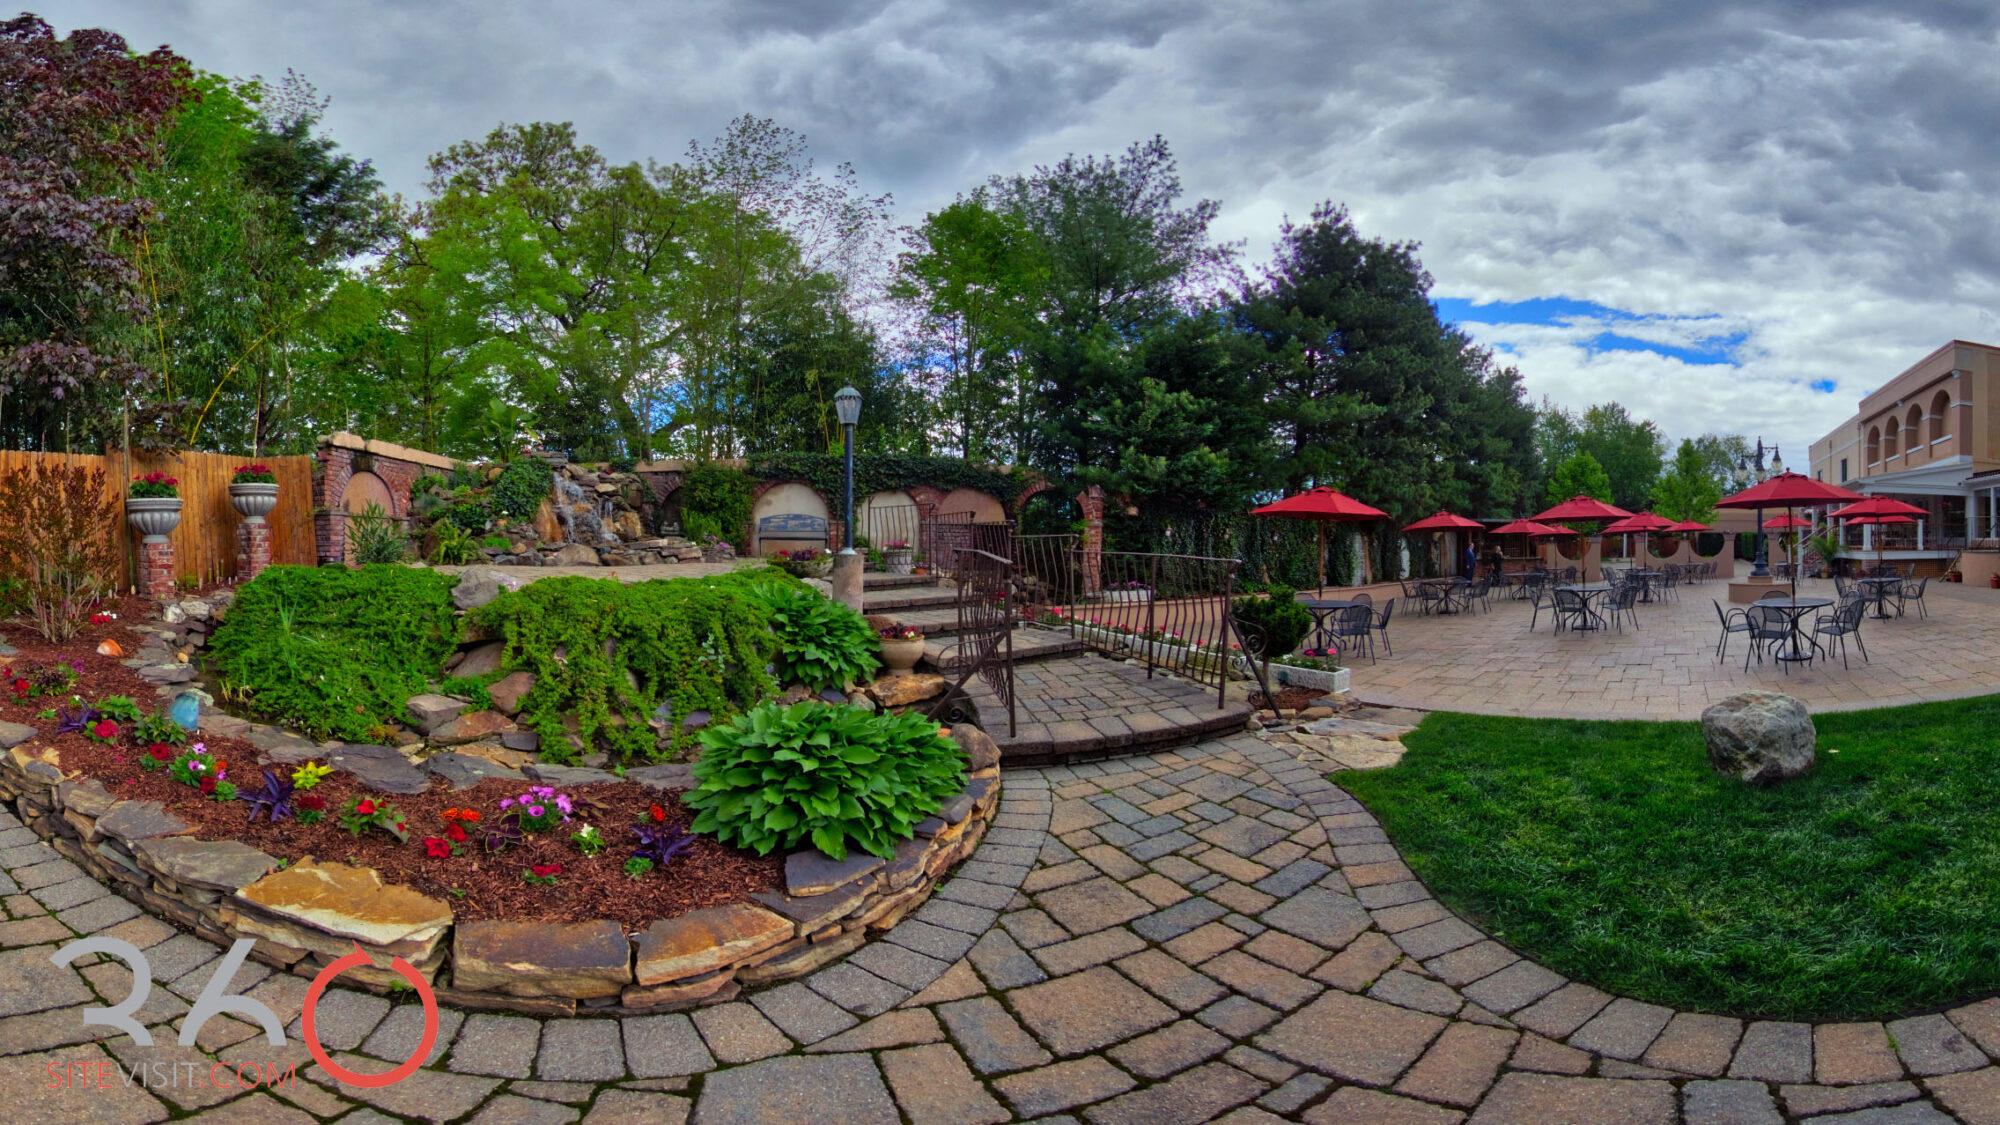 52-Il Tulipo Cedar Grove, NJ virtual tour by 360sitevisit